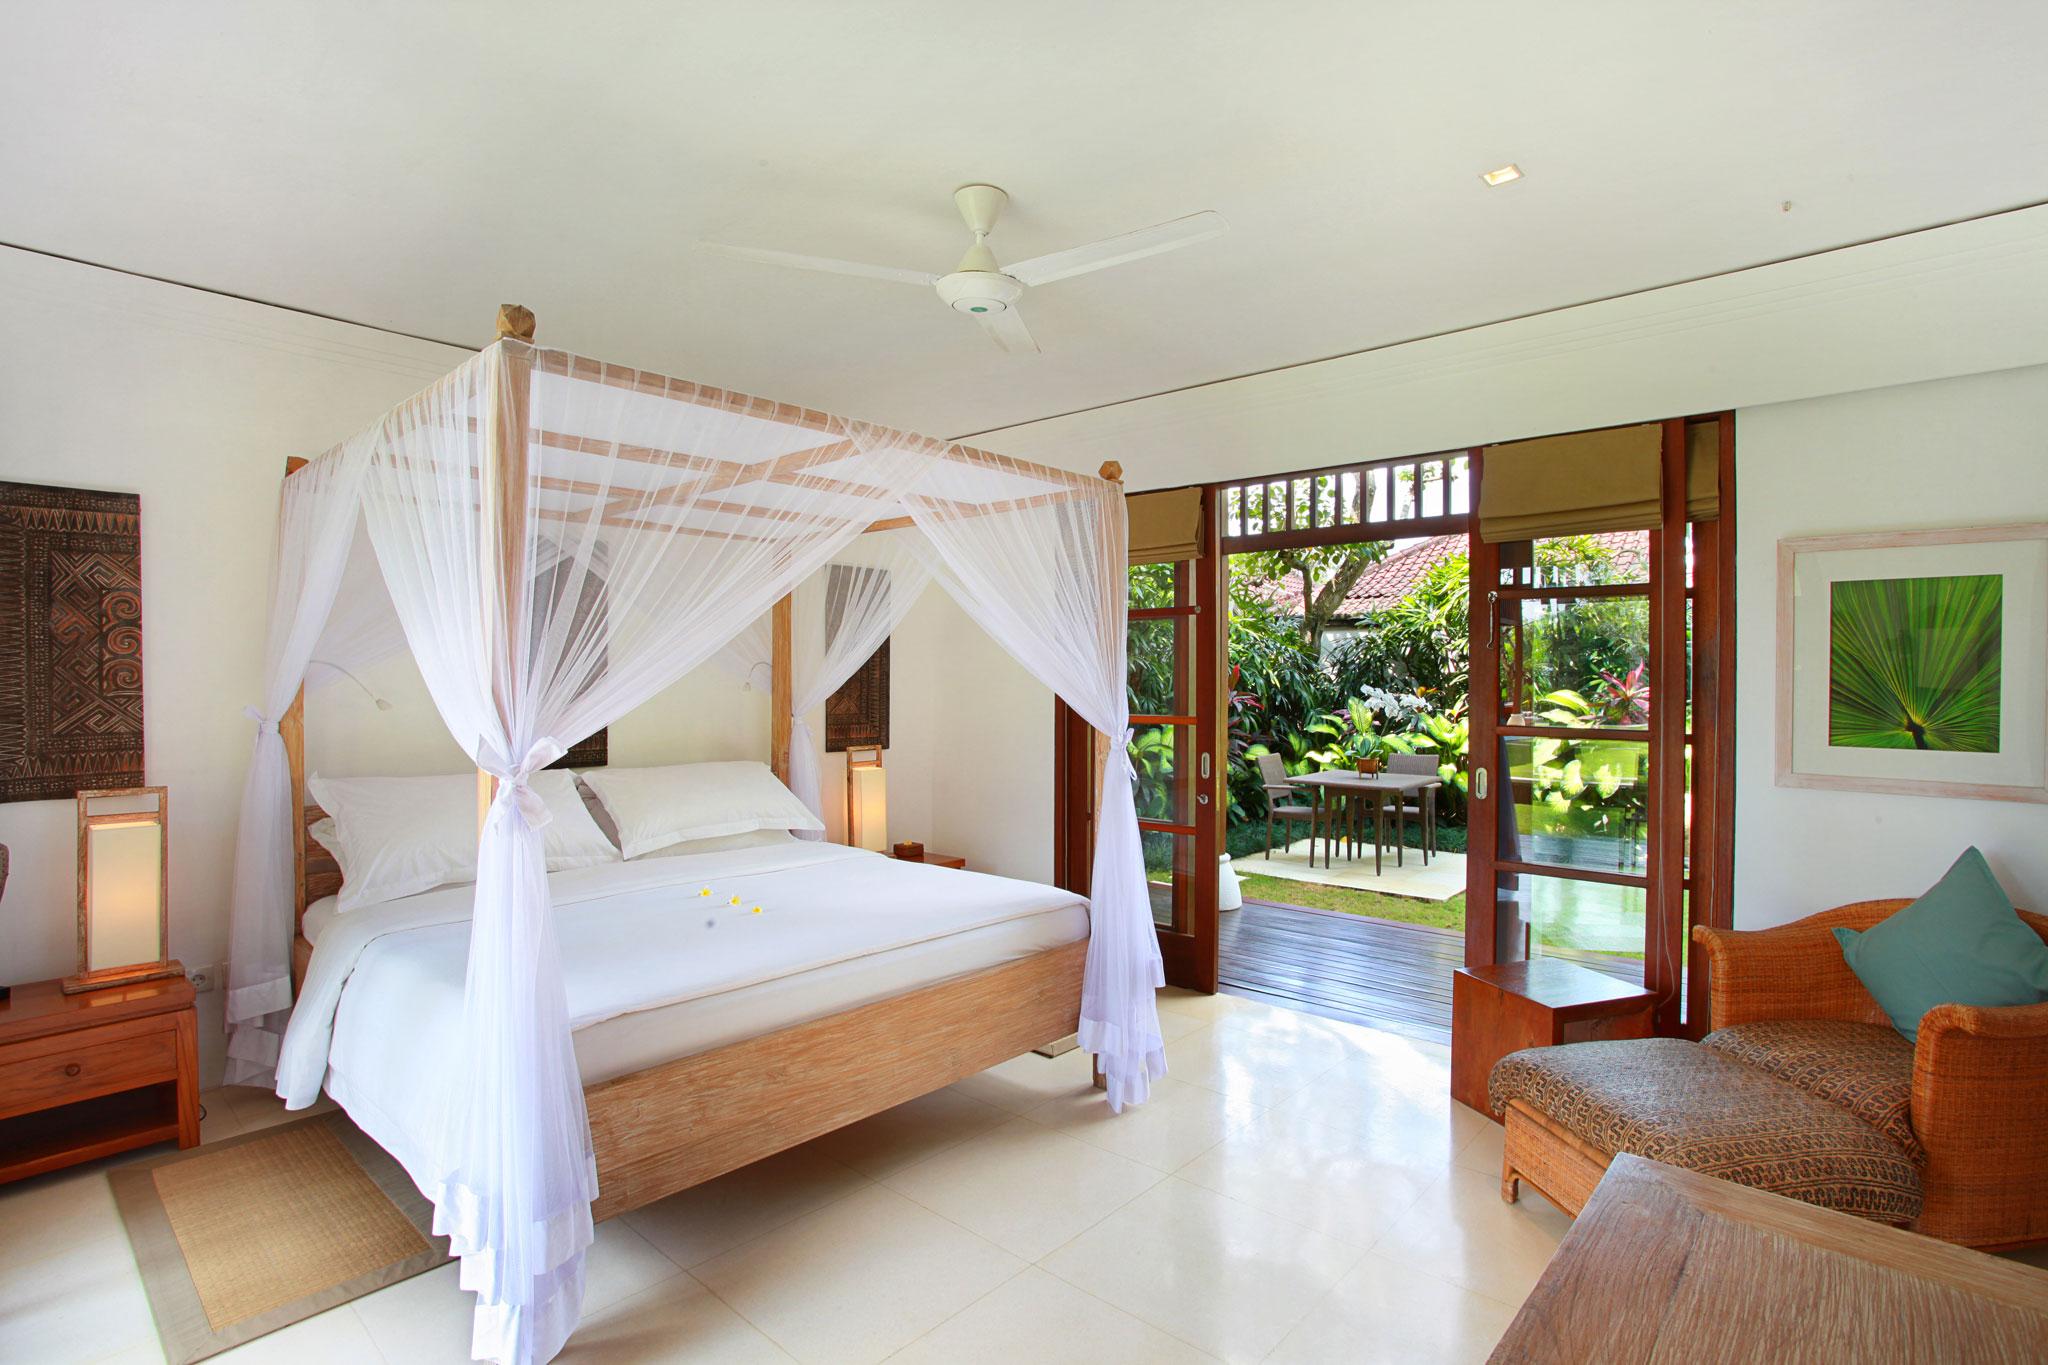 villa-kemah-tinggi-taman-bedroom-7146